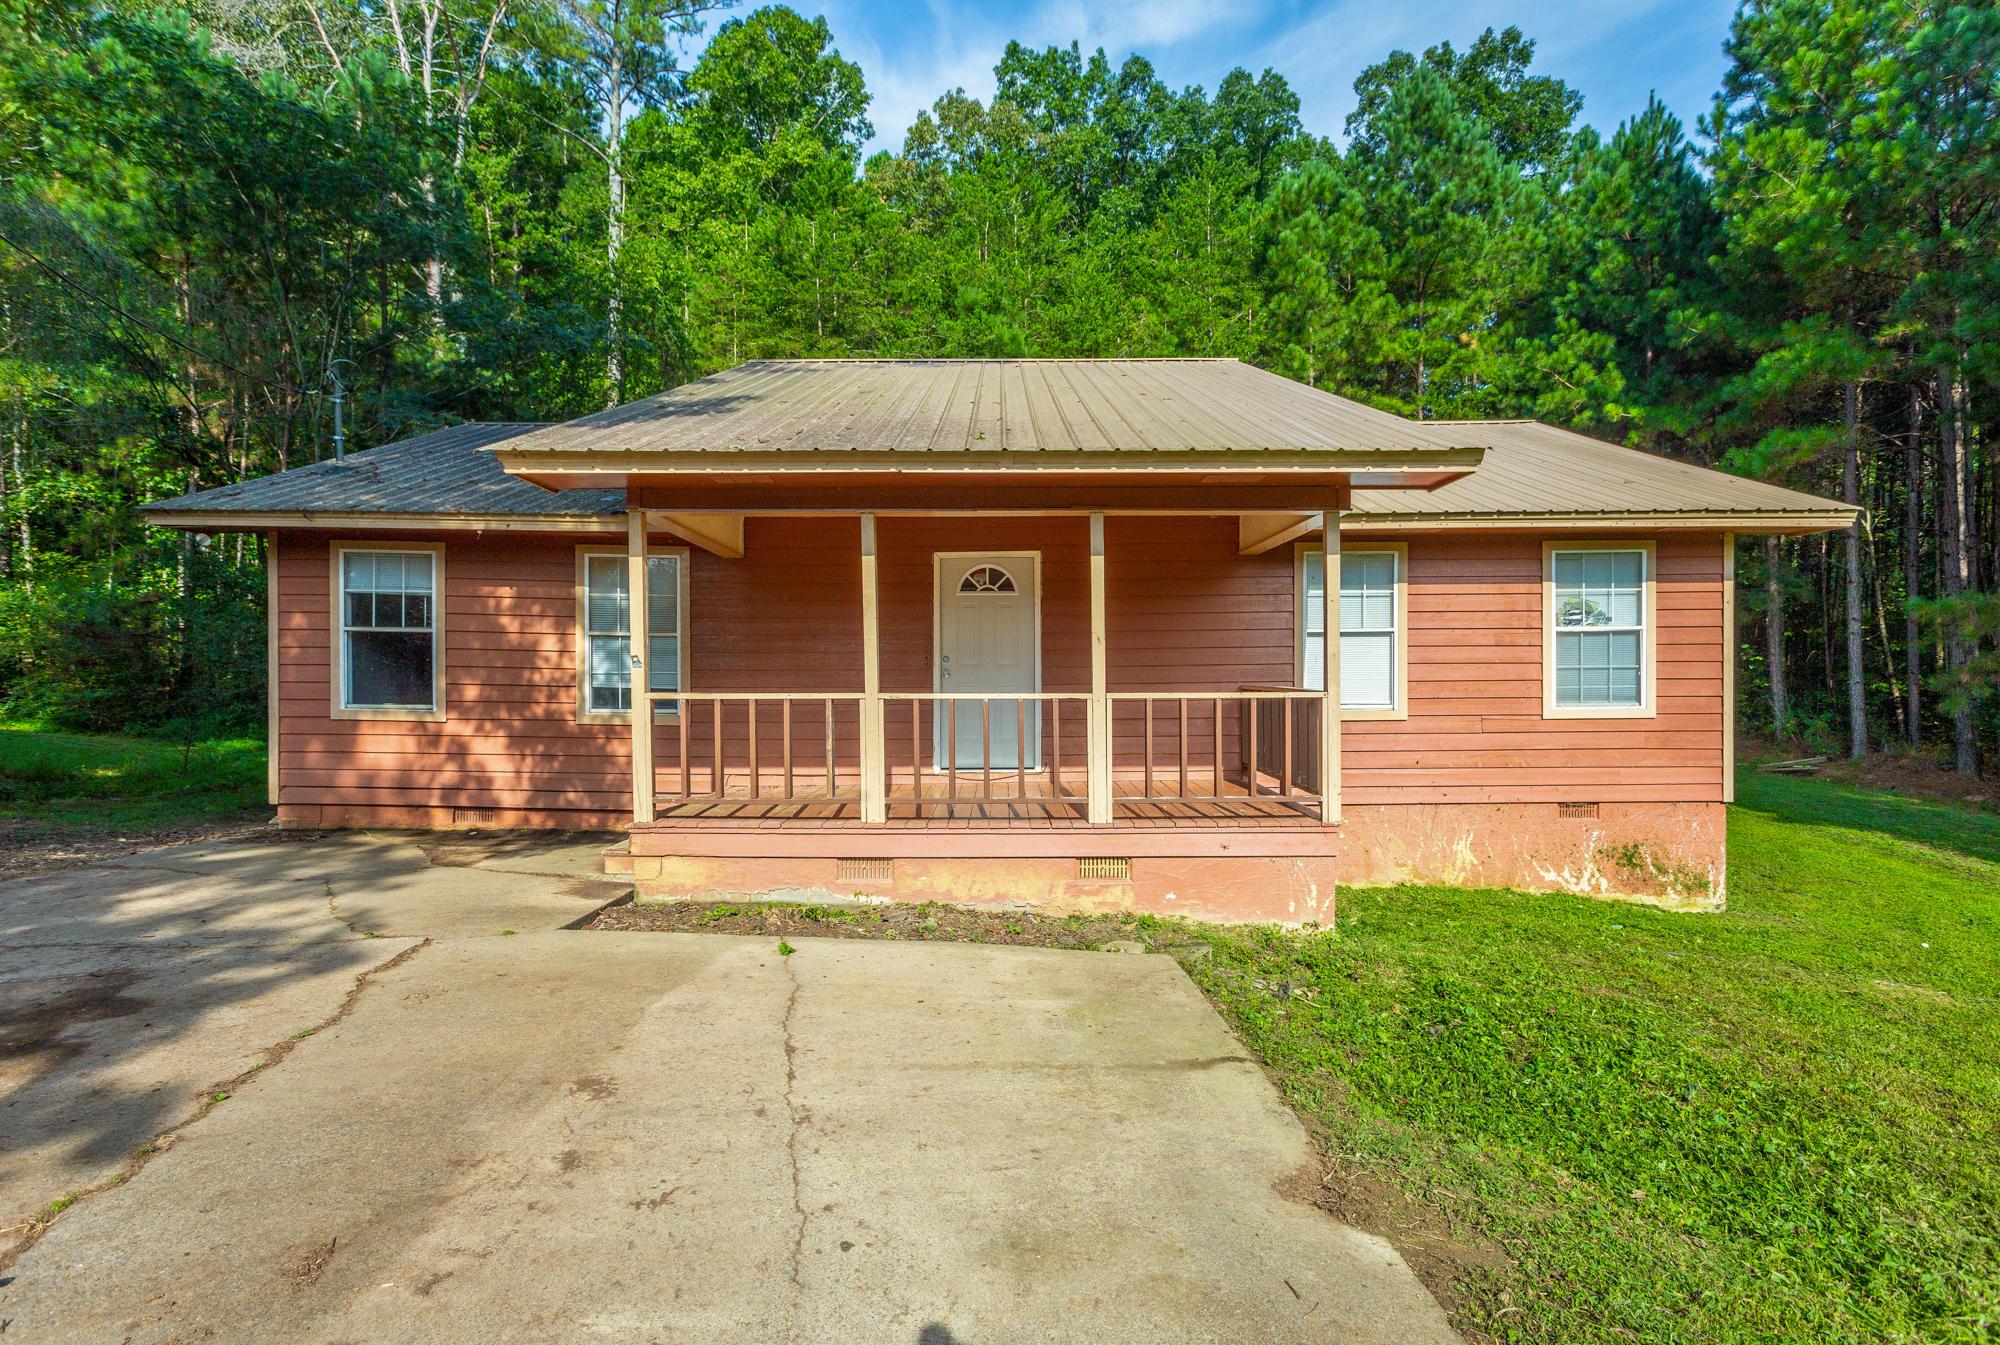 572 Houston Valley Rd, Ringgold, GA 30736